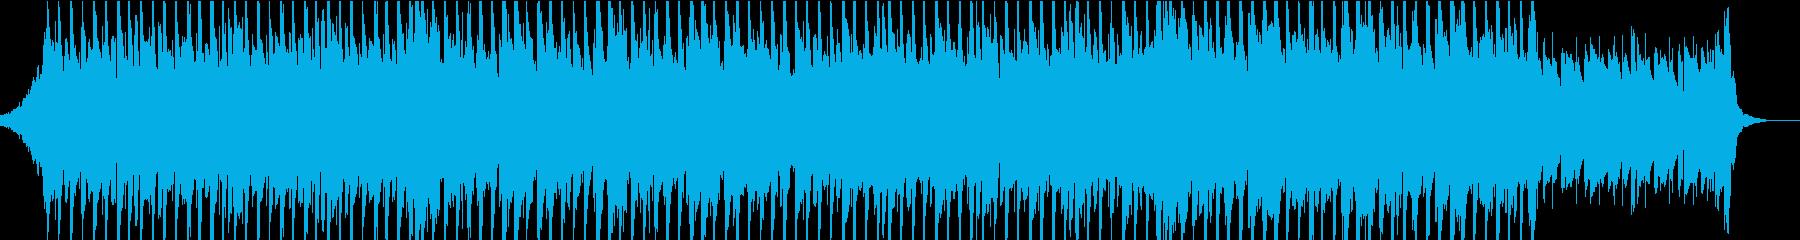 Folk Acousticの再生済みの波形